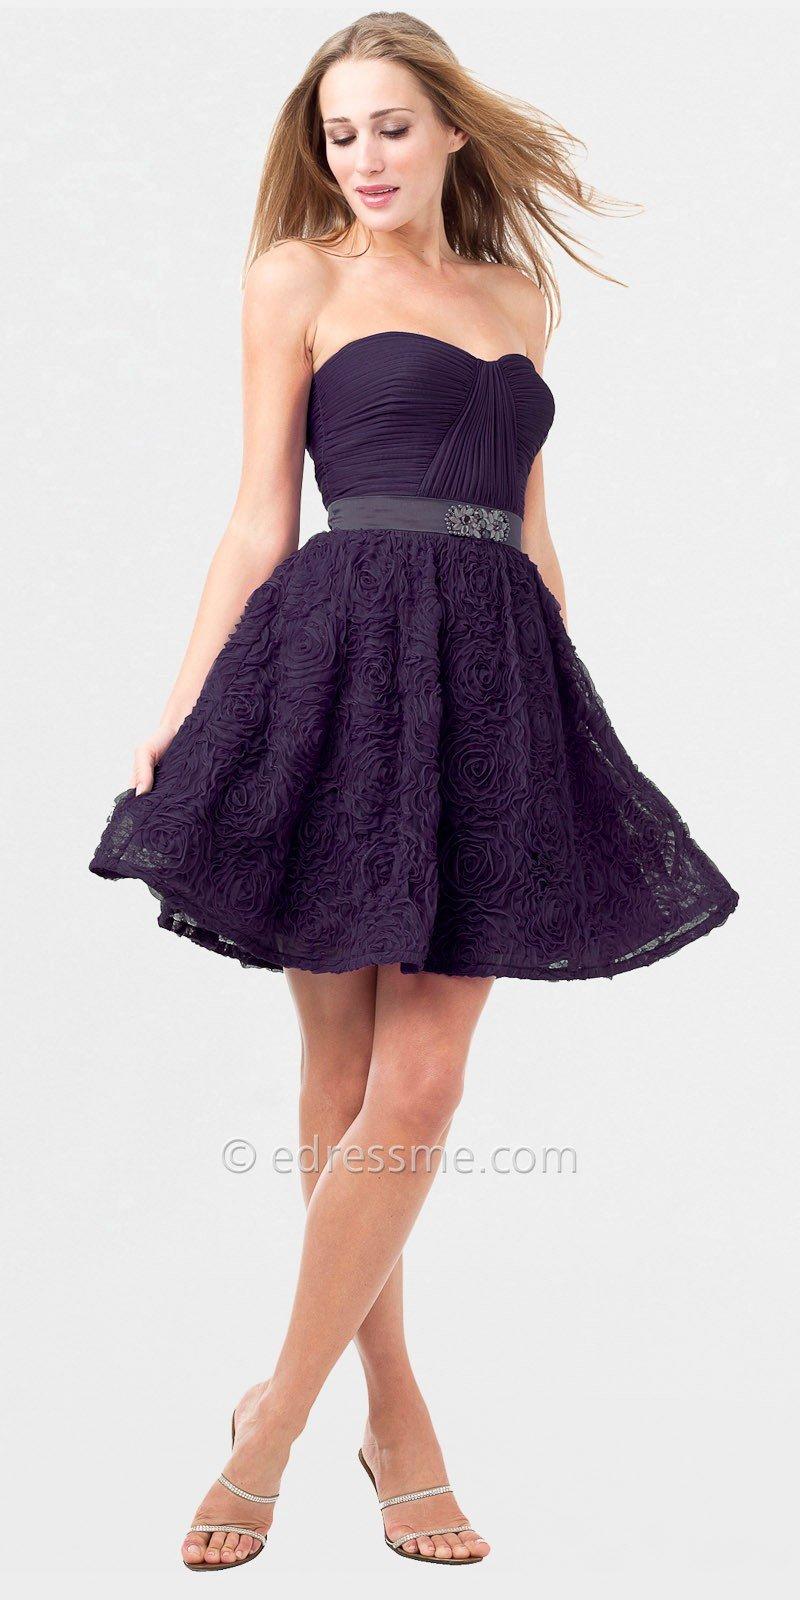 vestido-roxo-para-festa